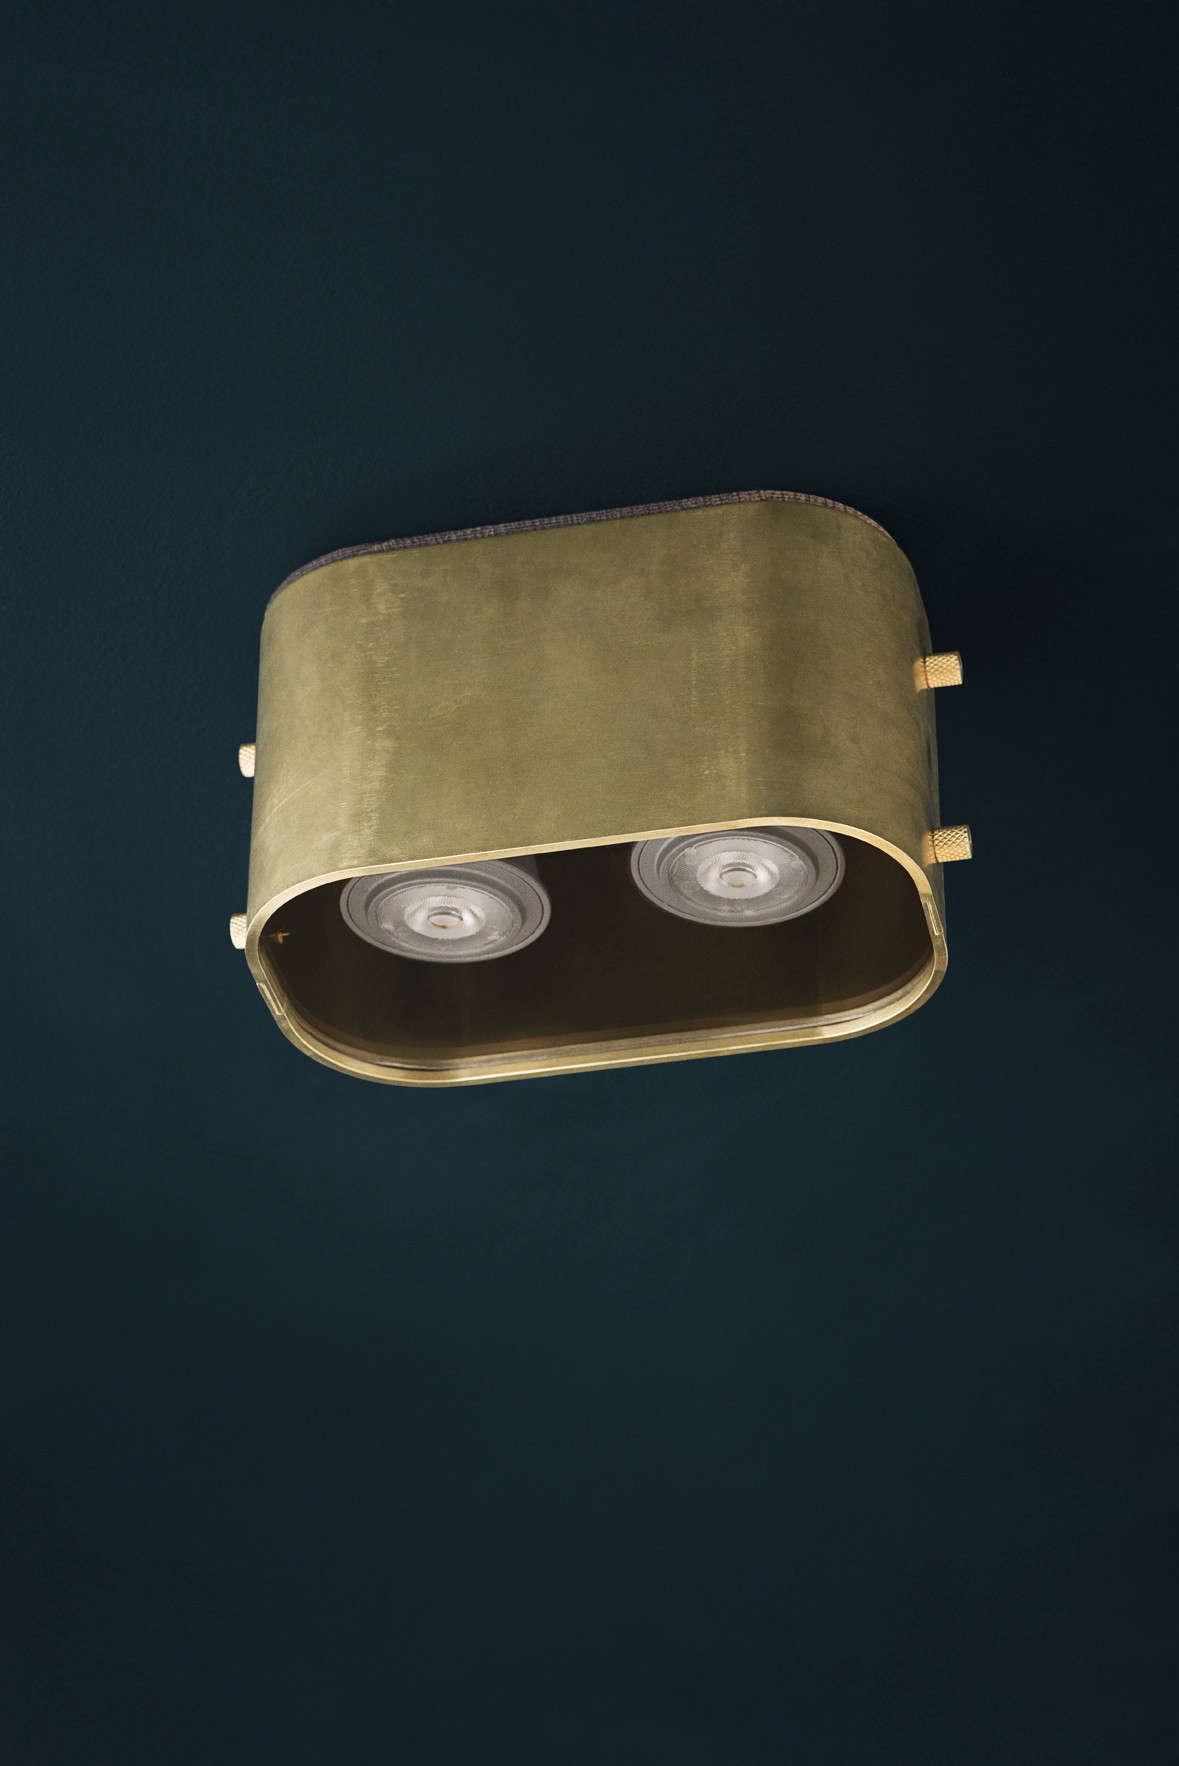 ArtisanDesigned Light Fixtures and Hardware from Copenhagen KBH brass spotlight remodelista